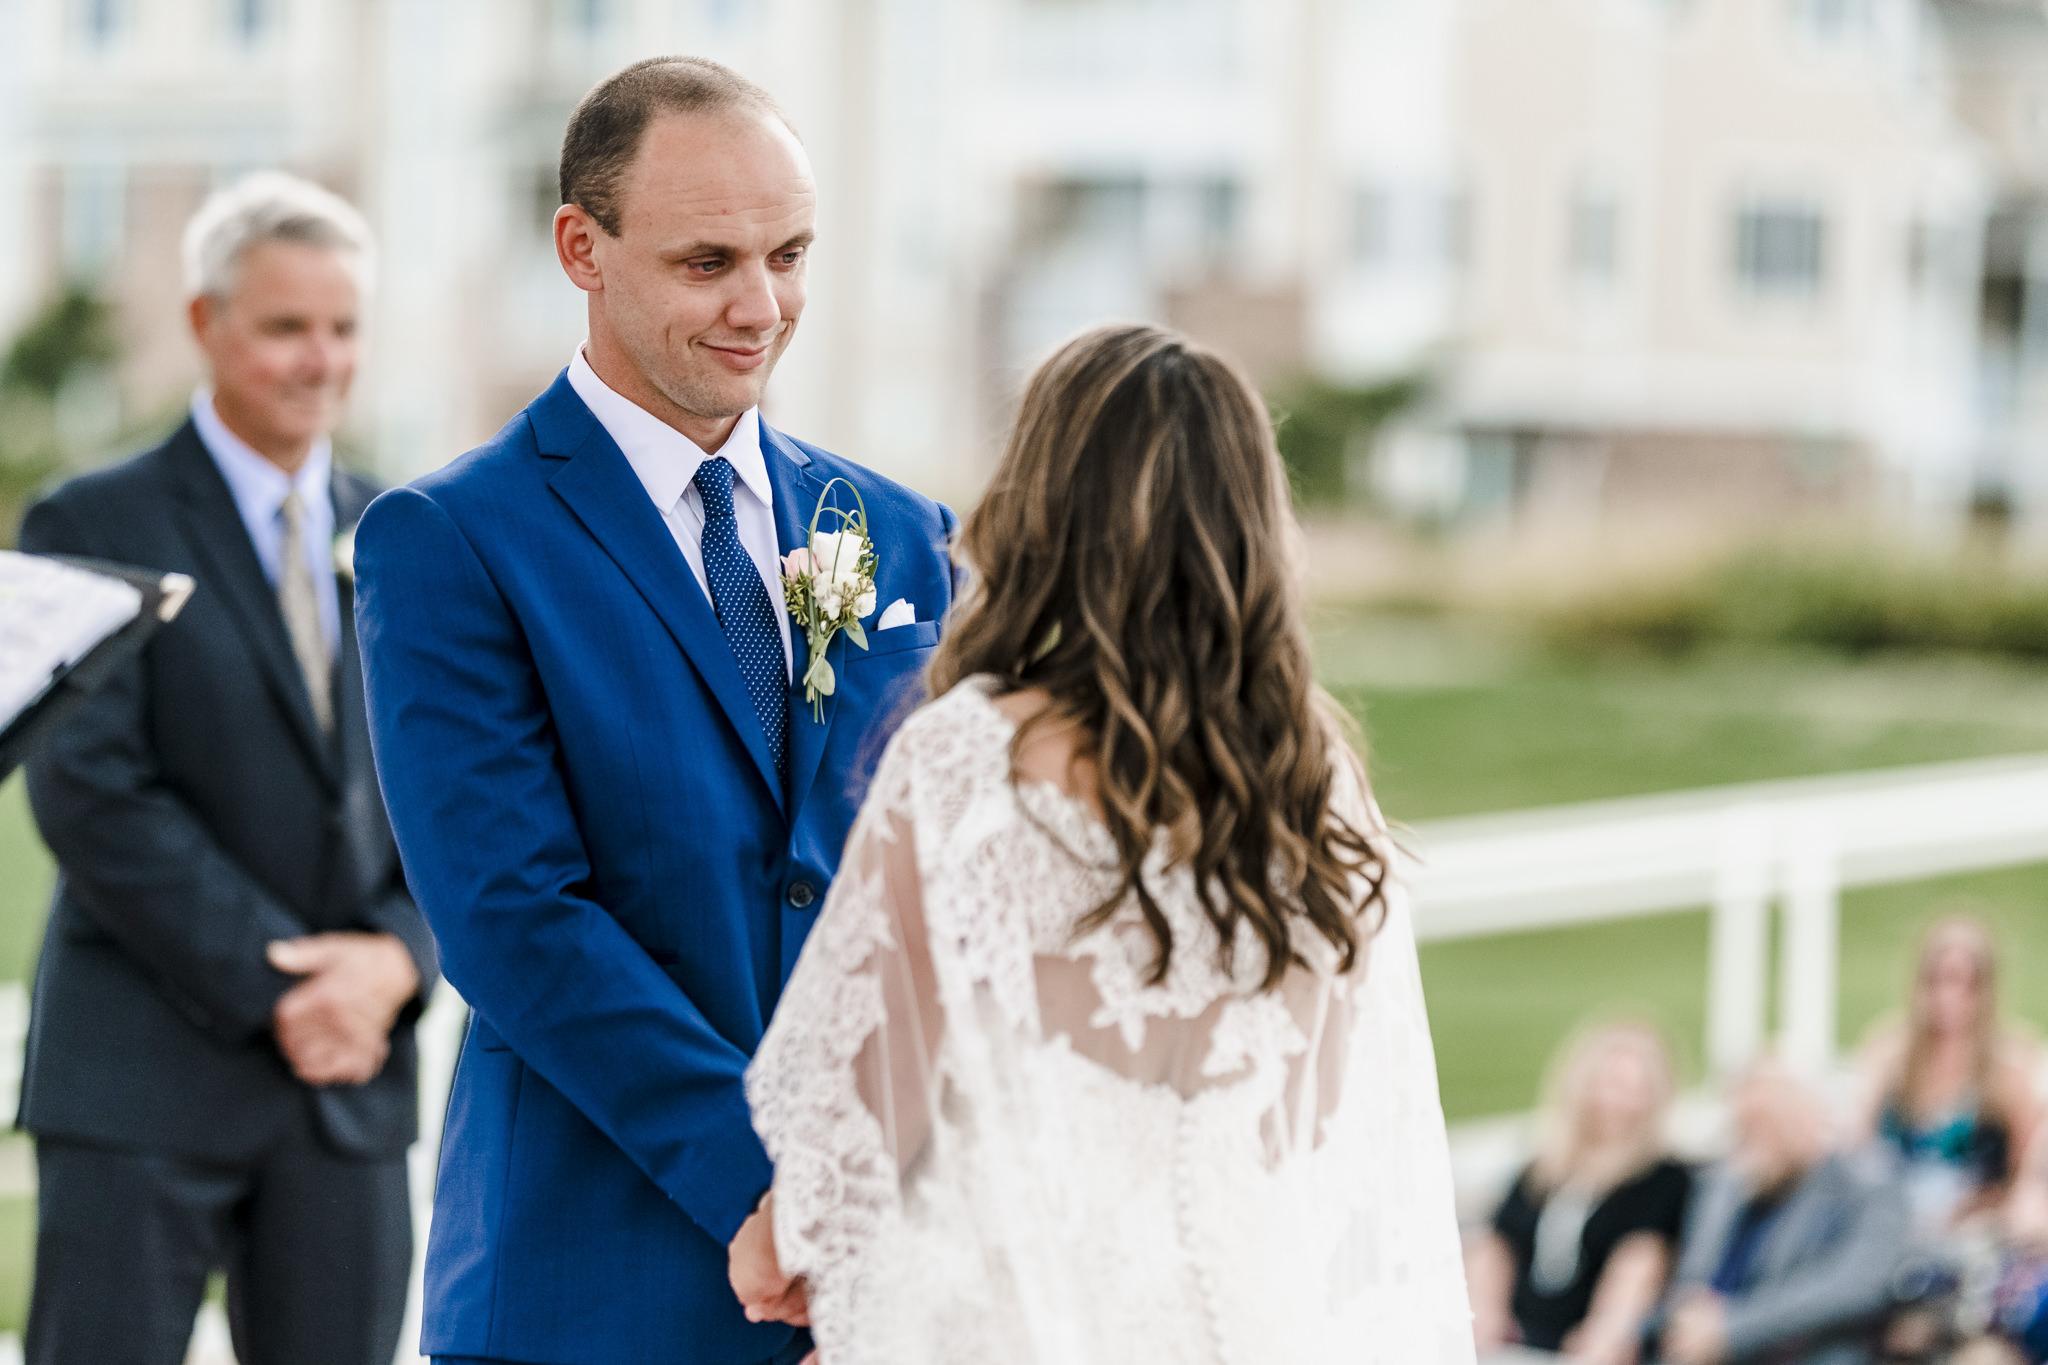 Culos-Sheraton-Eatontown-Long-Branch-Wedding-Photographer-19.JPG